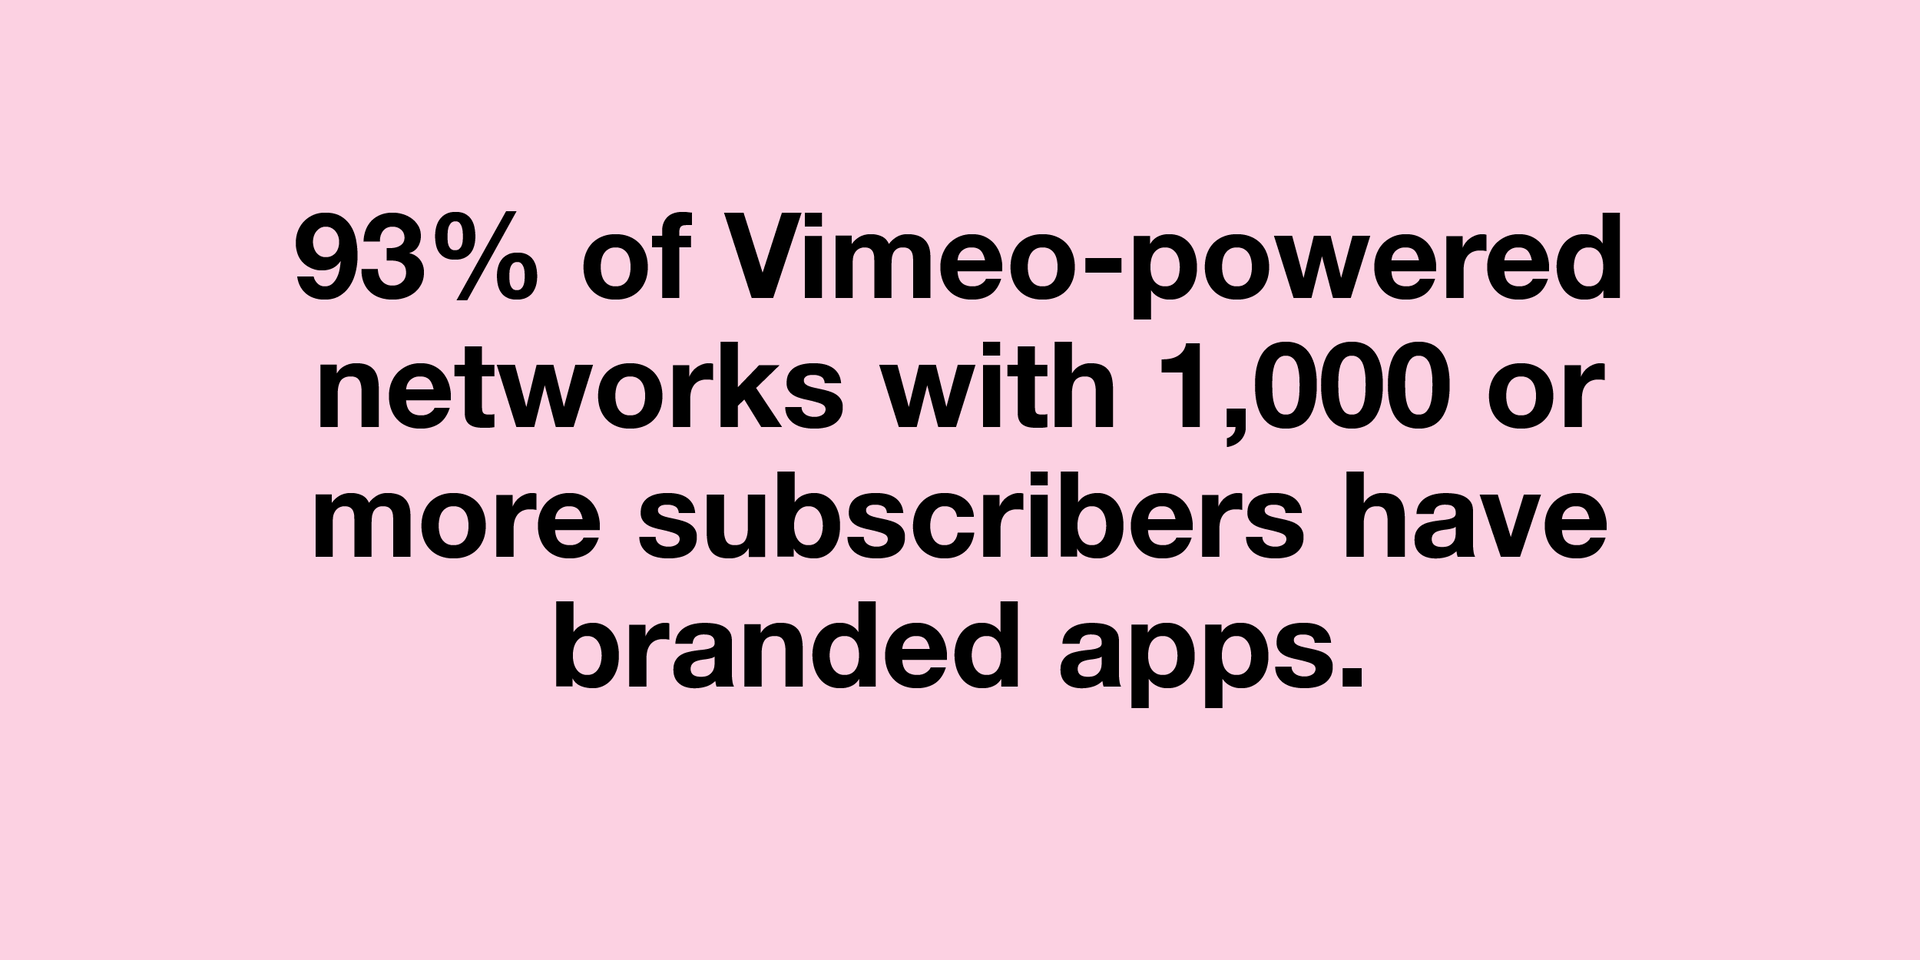 93 percent branded apps stat